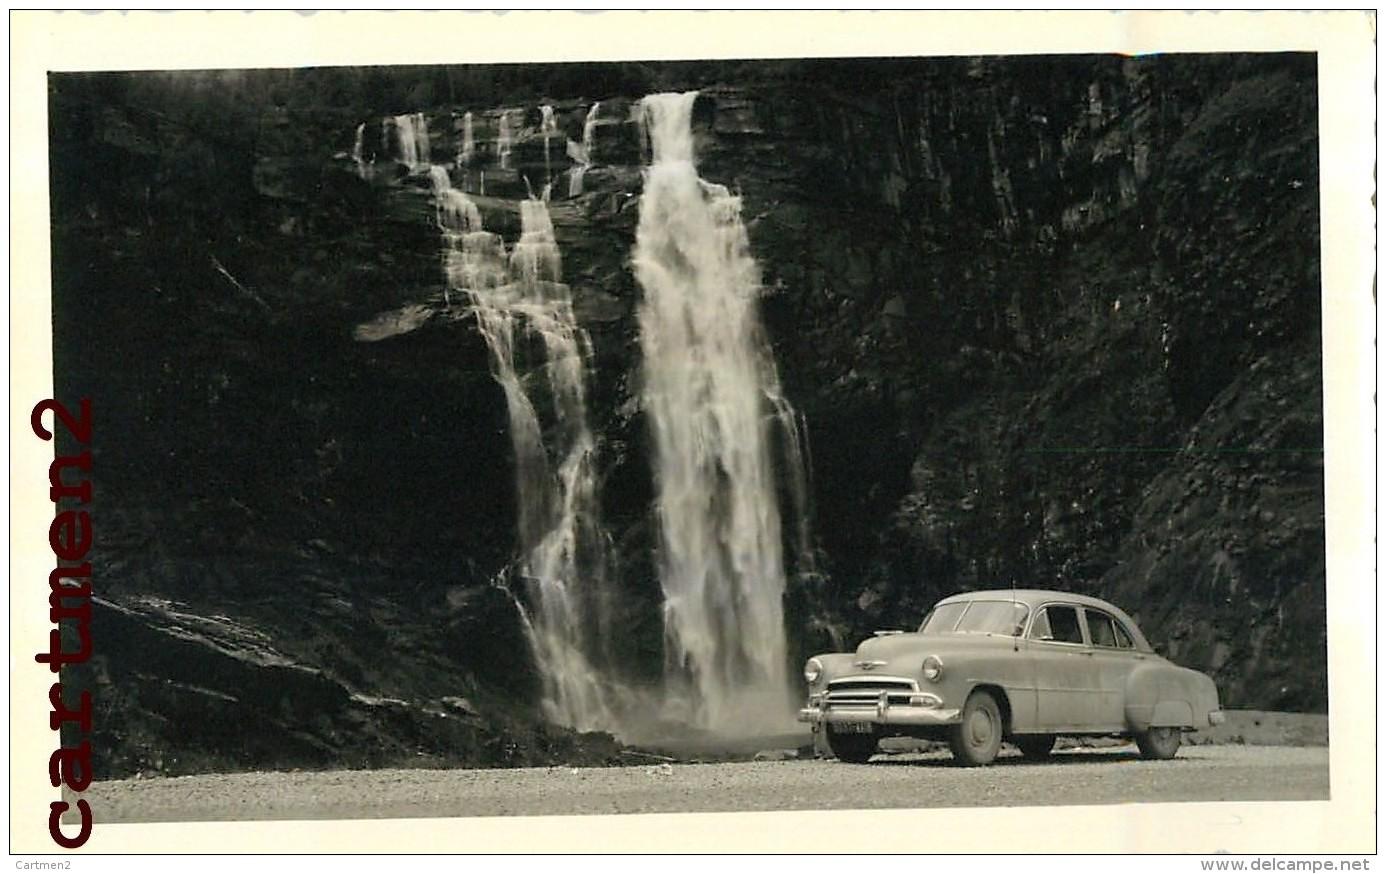 13 PHOTOGRAPHIES ANCIENNES : NORVEGE NORWAY HARDANGE FJORD TELEMARK RJUKAN NARVIK ISLO AUTOMOBILE CAR - Noorwegen